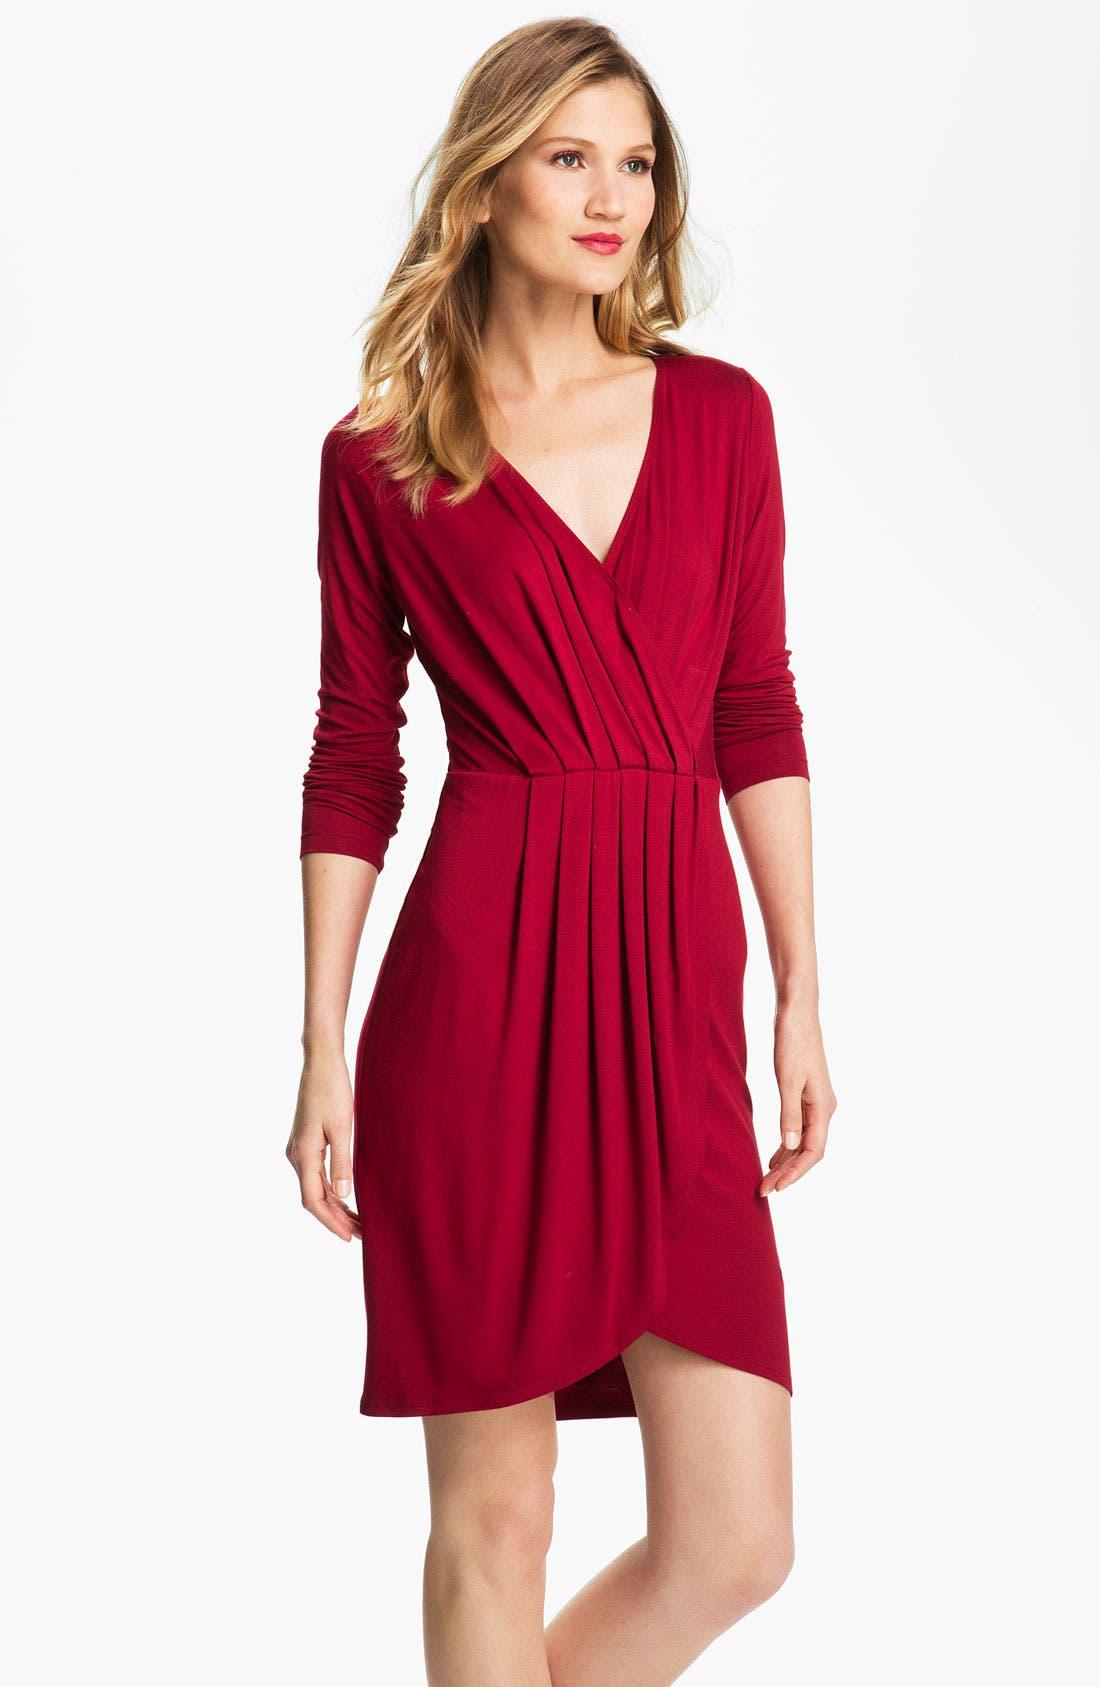 Alternate Image 1 Selected - Karen Kane Pleated Faux Wrap Dress